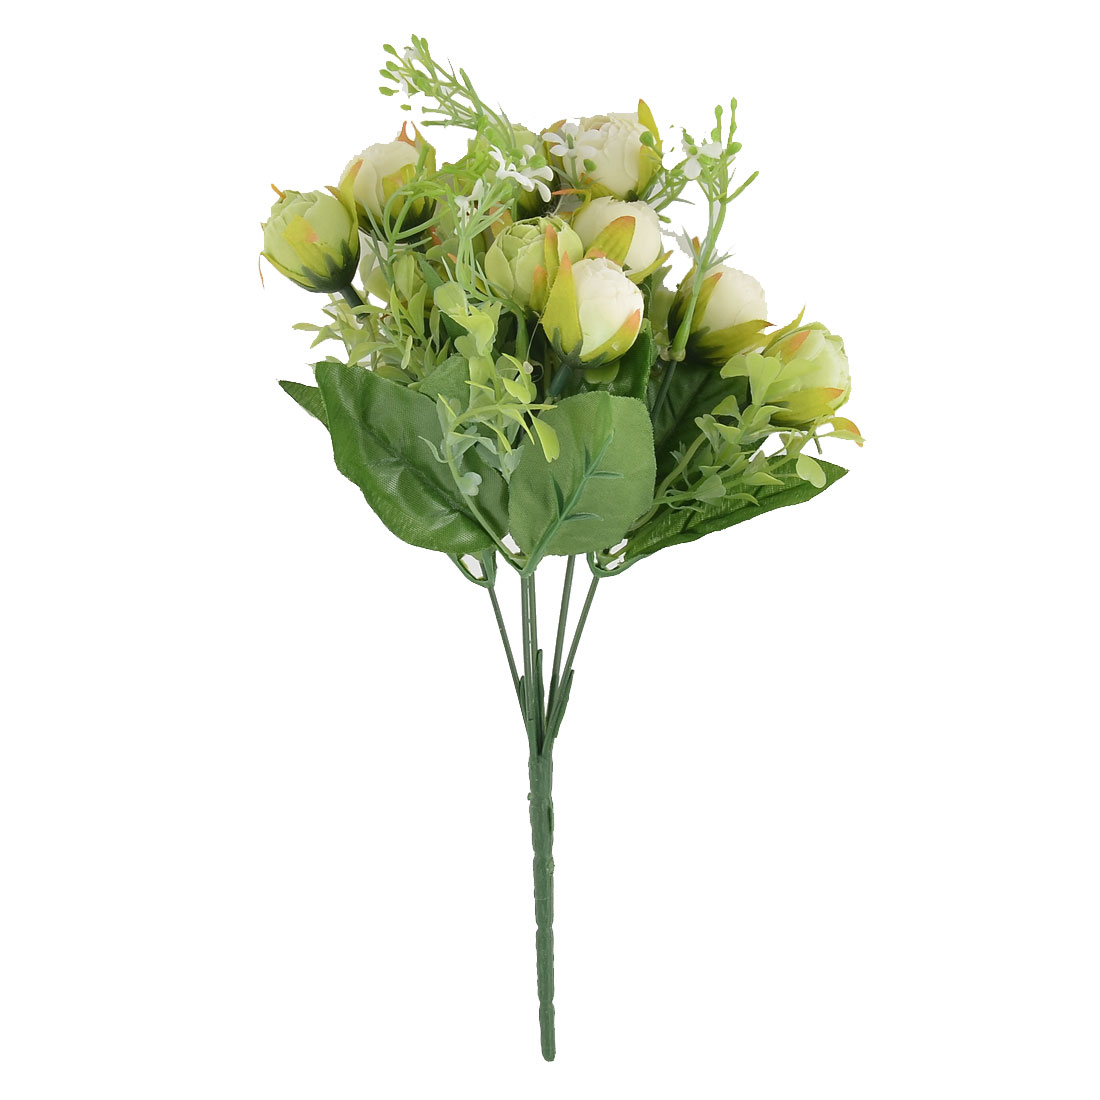 Wedding Banquet Table Decor 10 Heads Camellia Flower Artificial Bouquet White